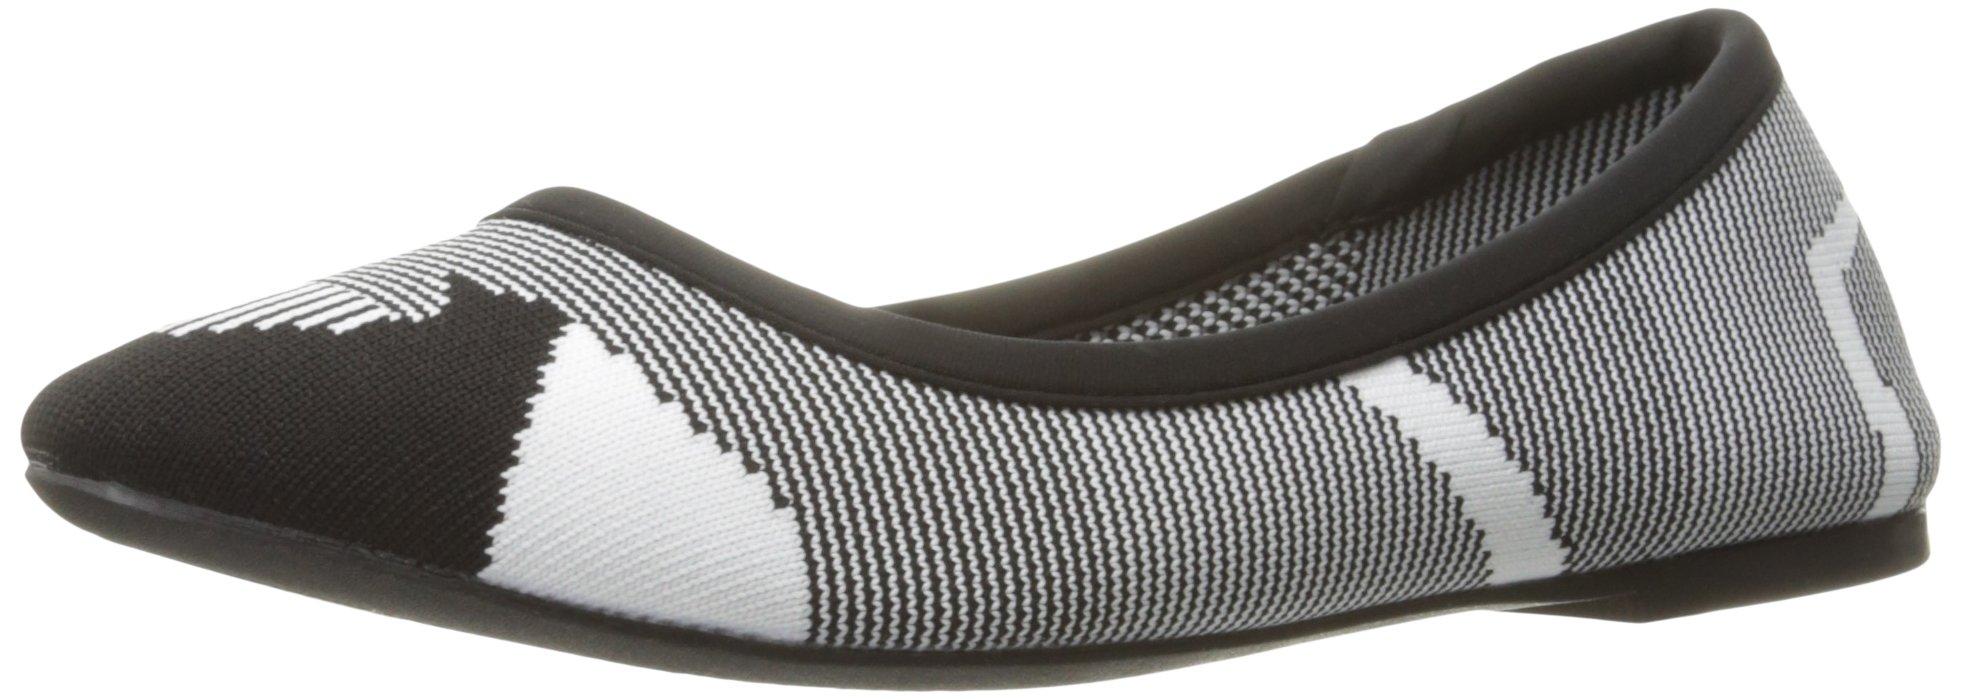 Skechers Women's Cleo Wham Flat, Black/White, 8.5 M US